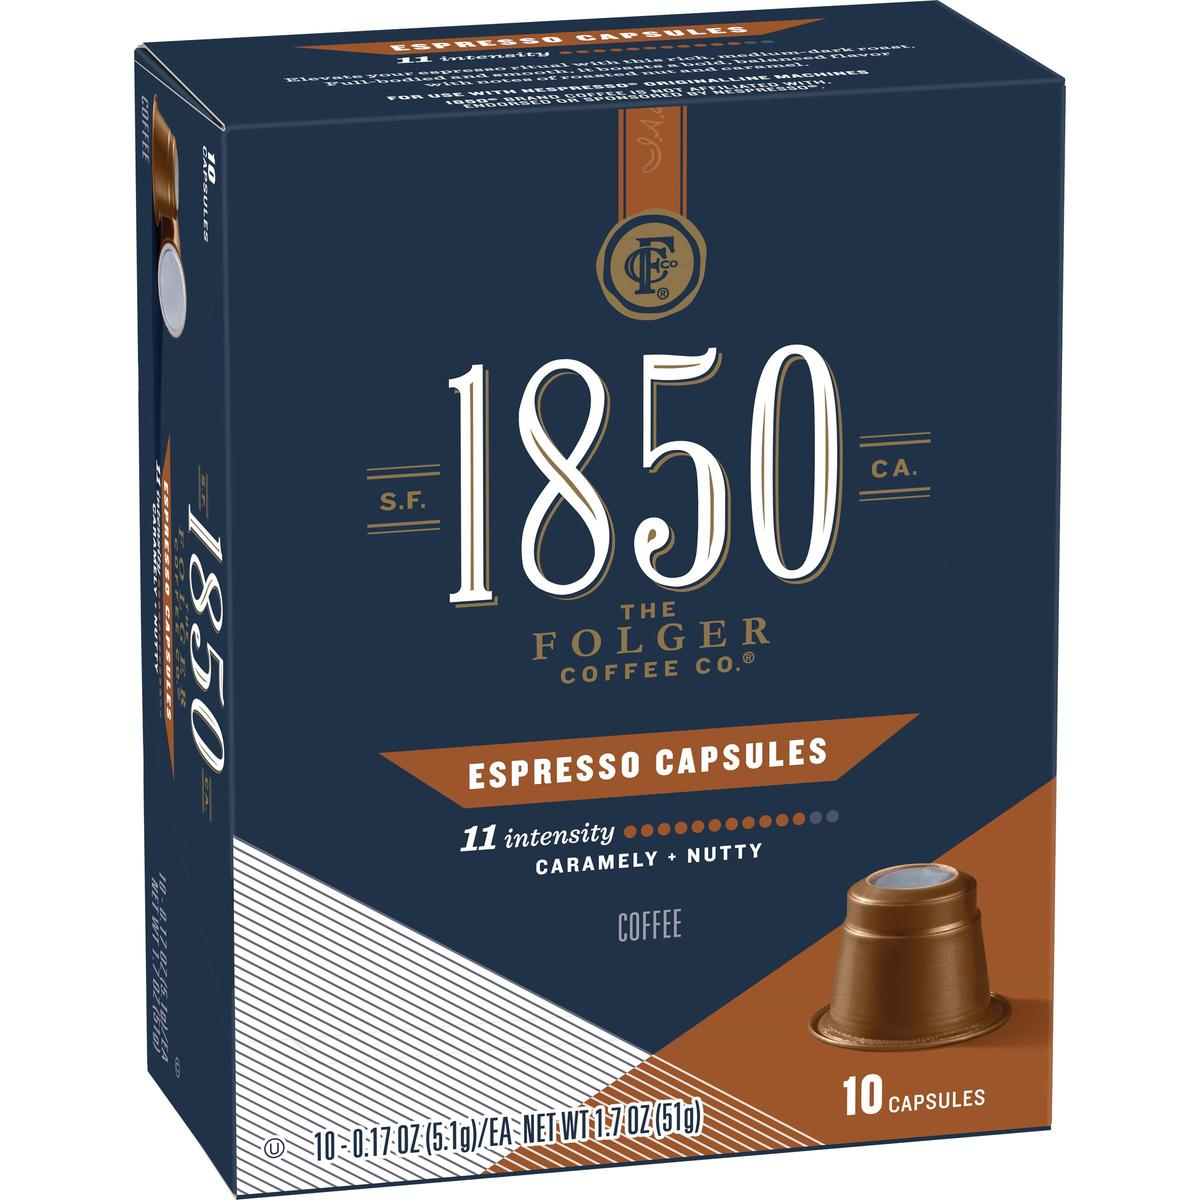 Folgers 1850 espresso capsules, 10 count box of espresso